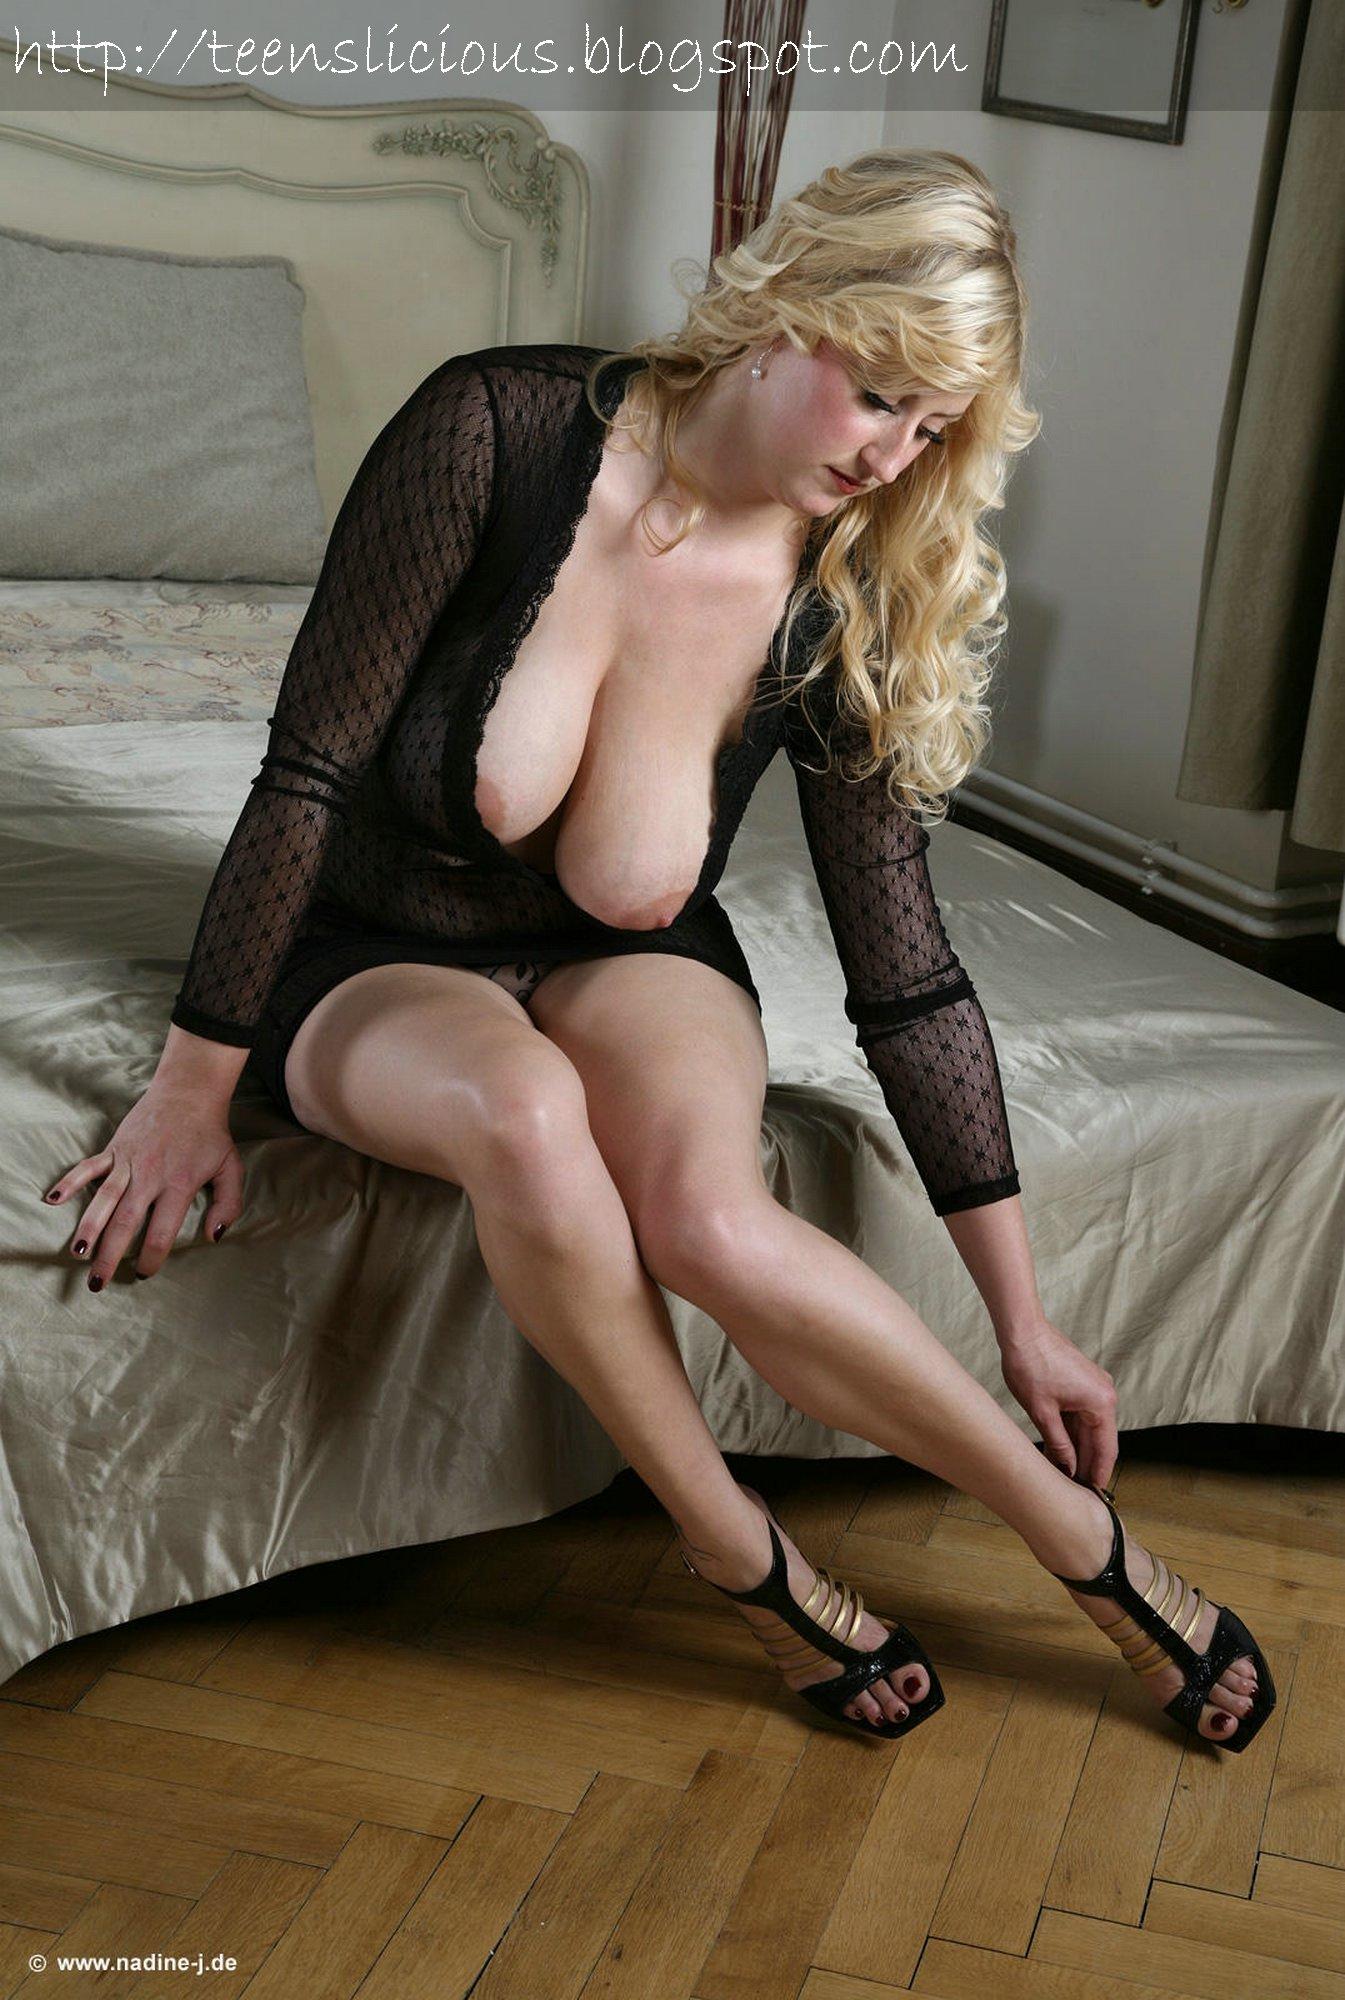 Image Hosting Sexy 25